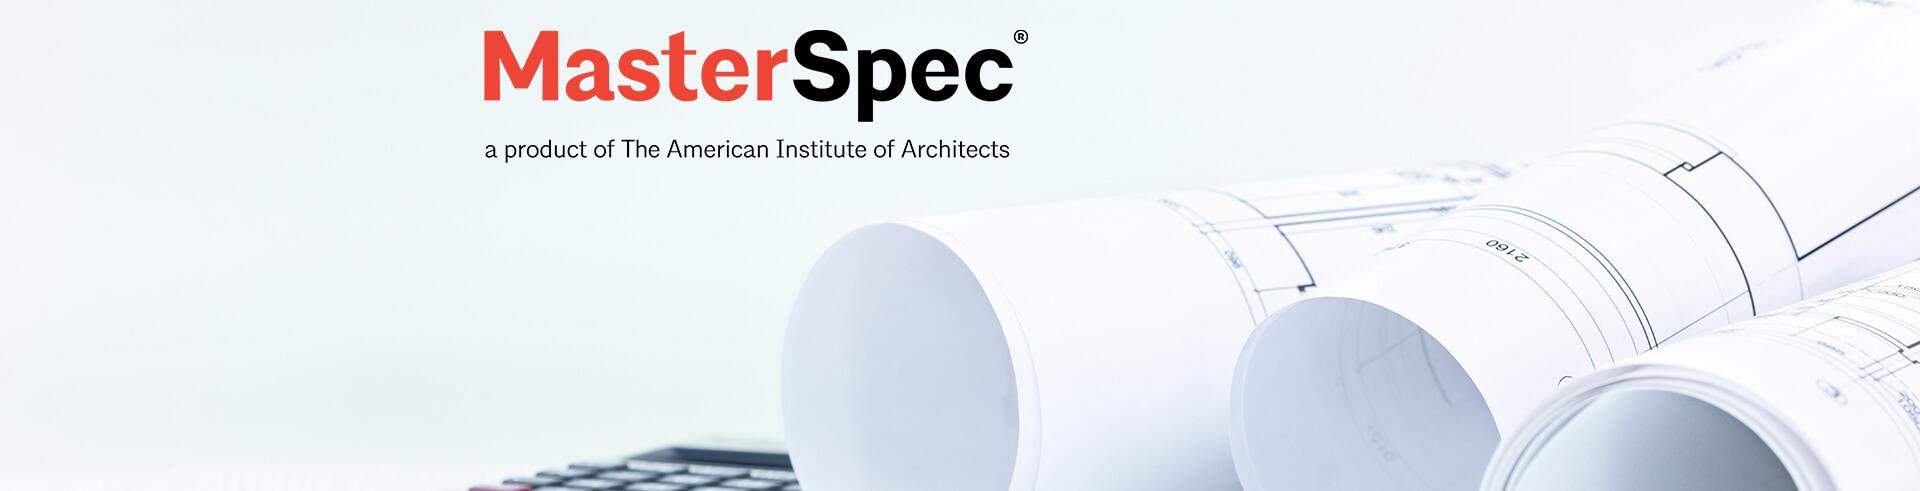 TTK水和油泄漏检测规范 写在了北美MasterSpec®规范上